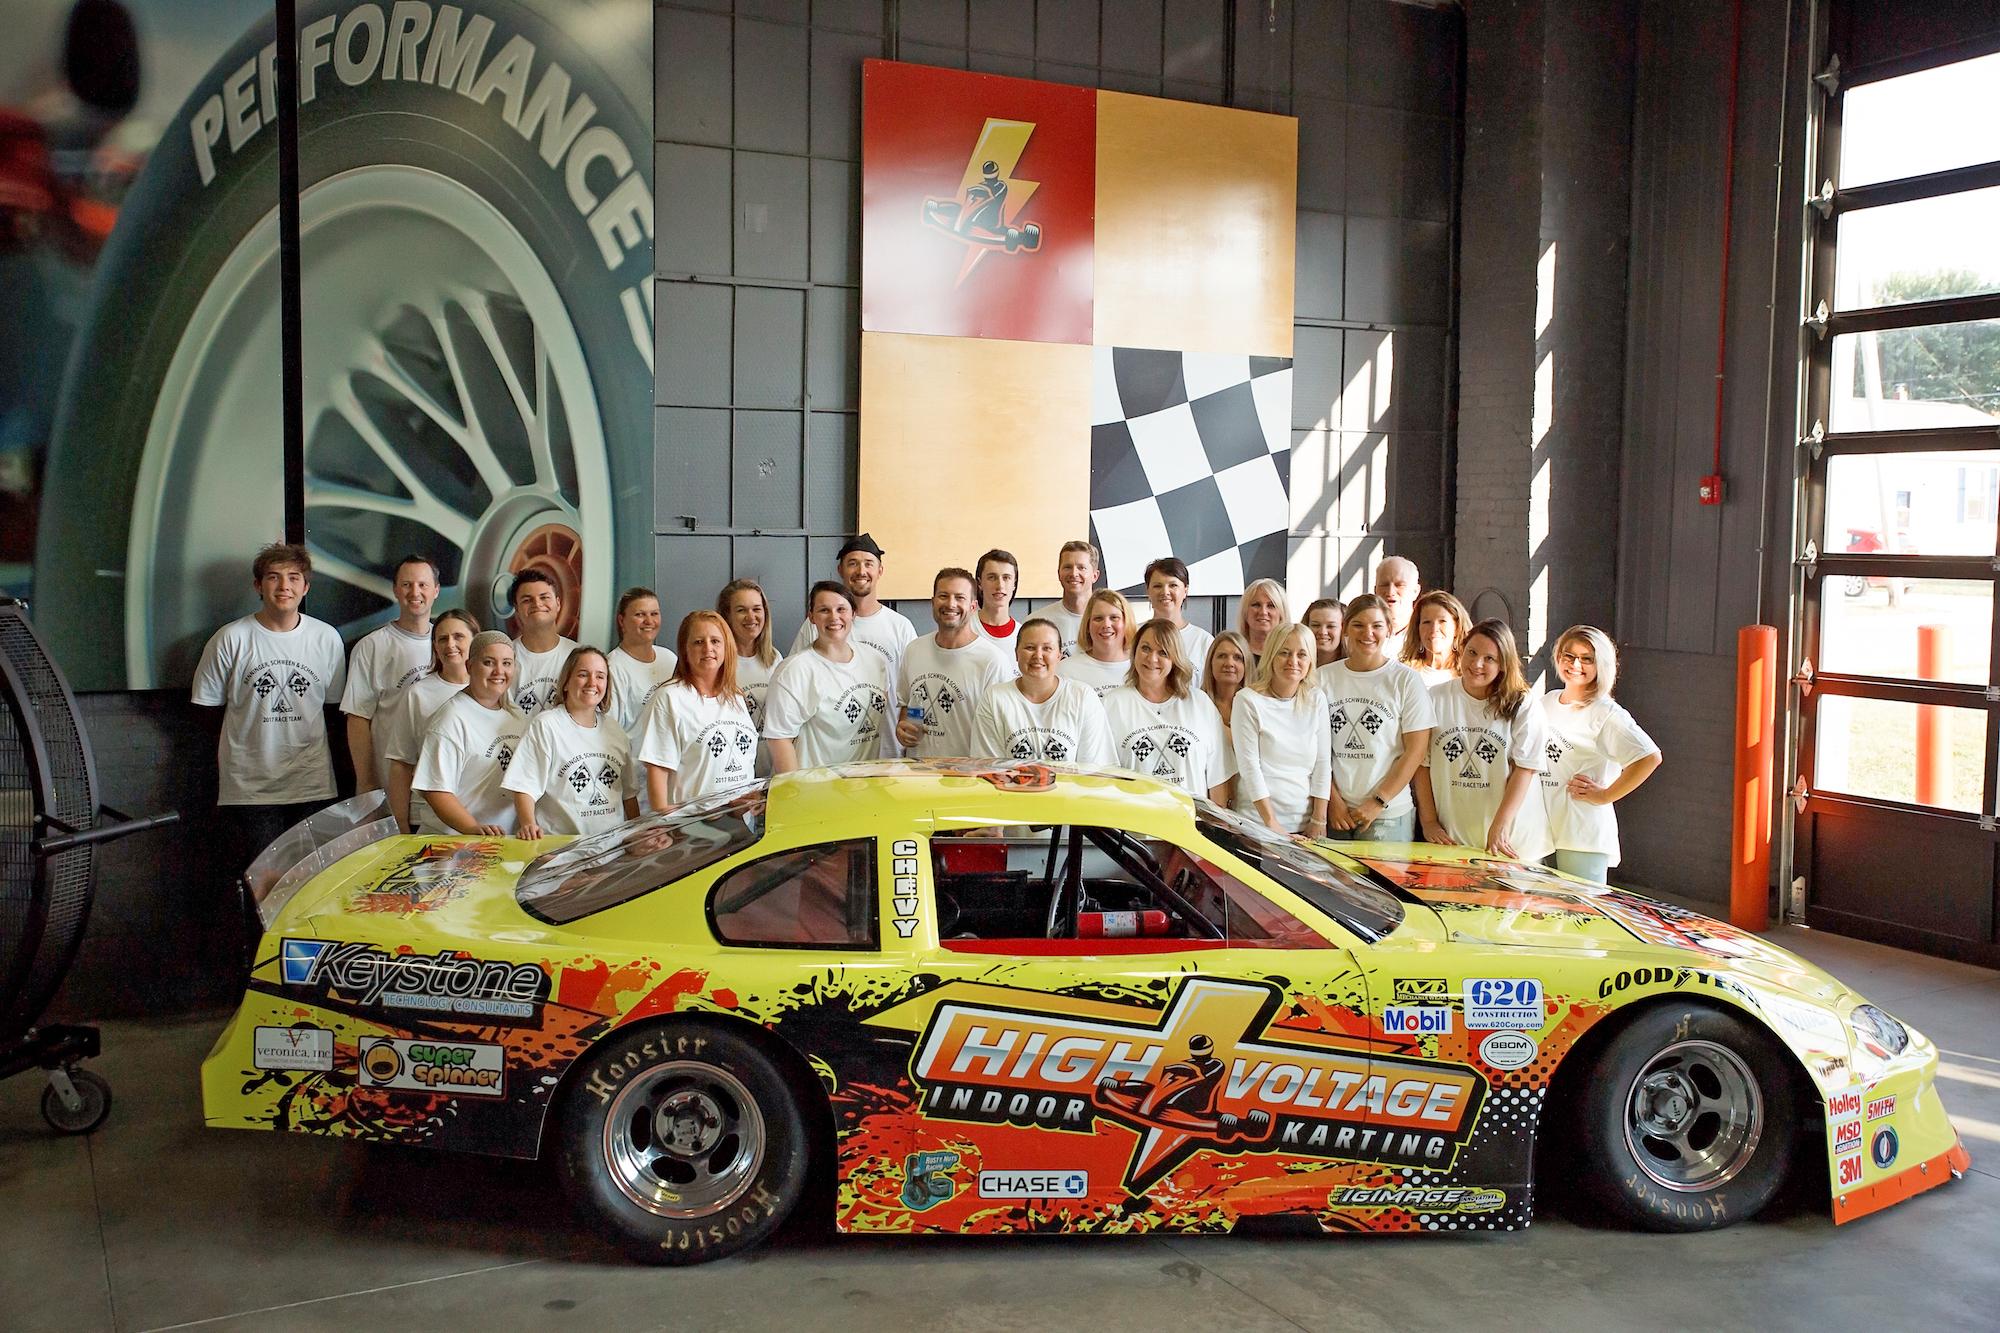 The Drs. Benninger, Schween, & Schmidt Team enjoy some high voltage indoor racing at a staff outing...